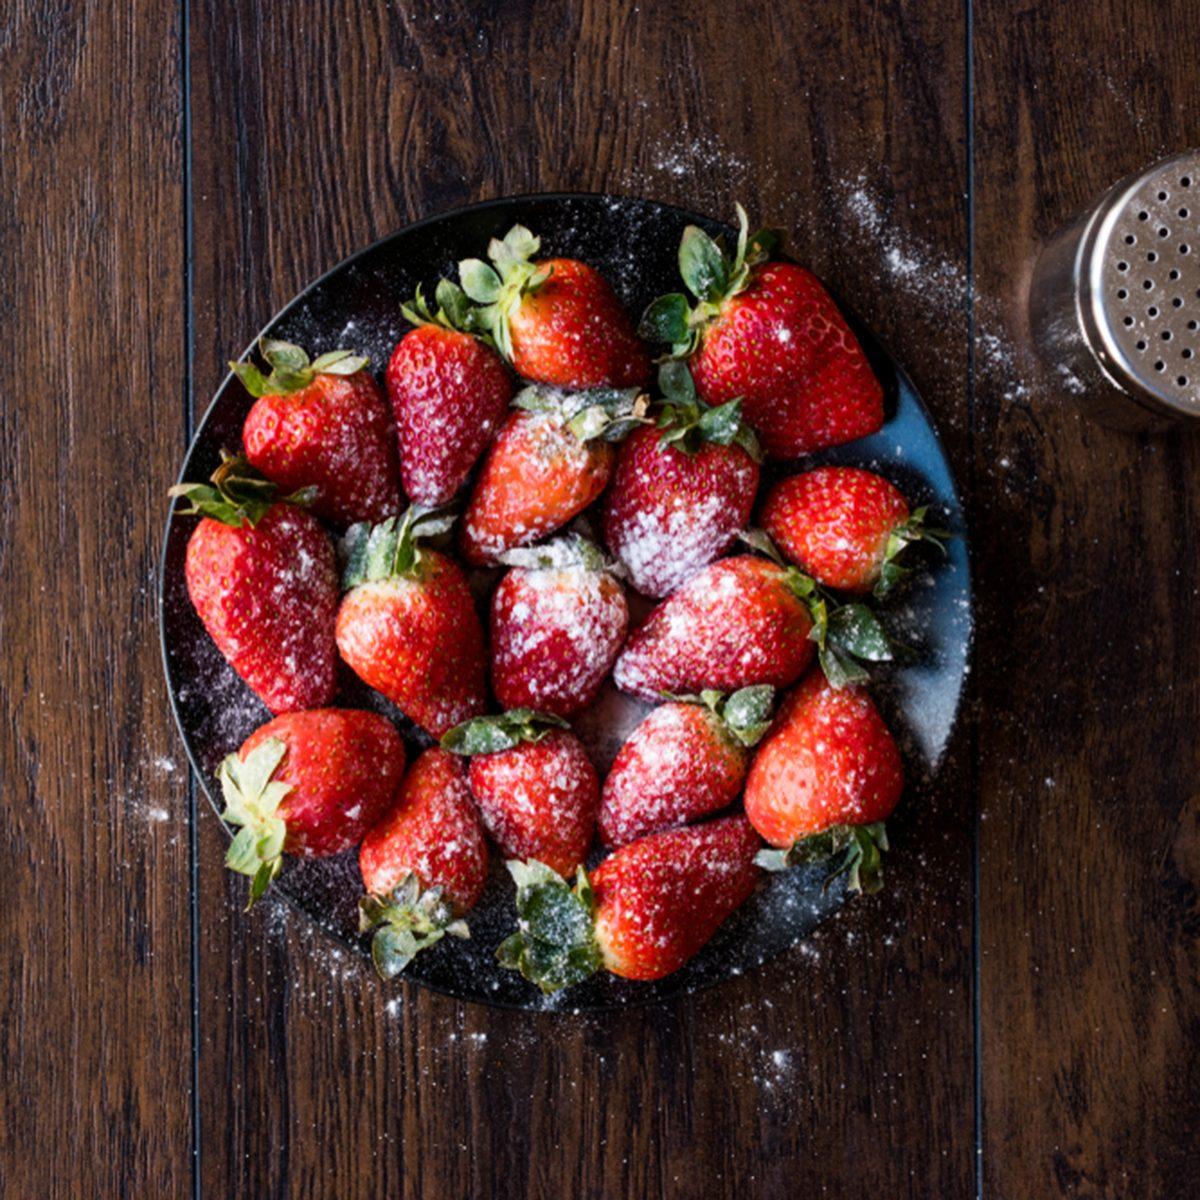 Fresh Organic Ripe Strawberries with Powdered Sugar on Black Plate.